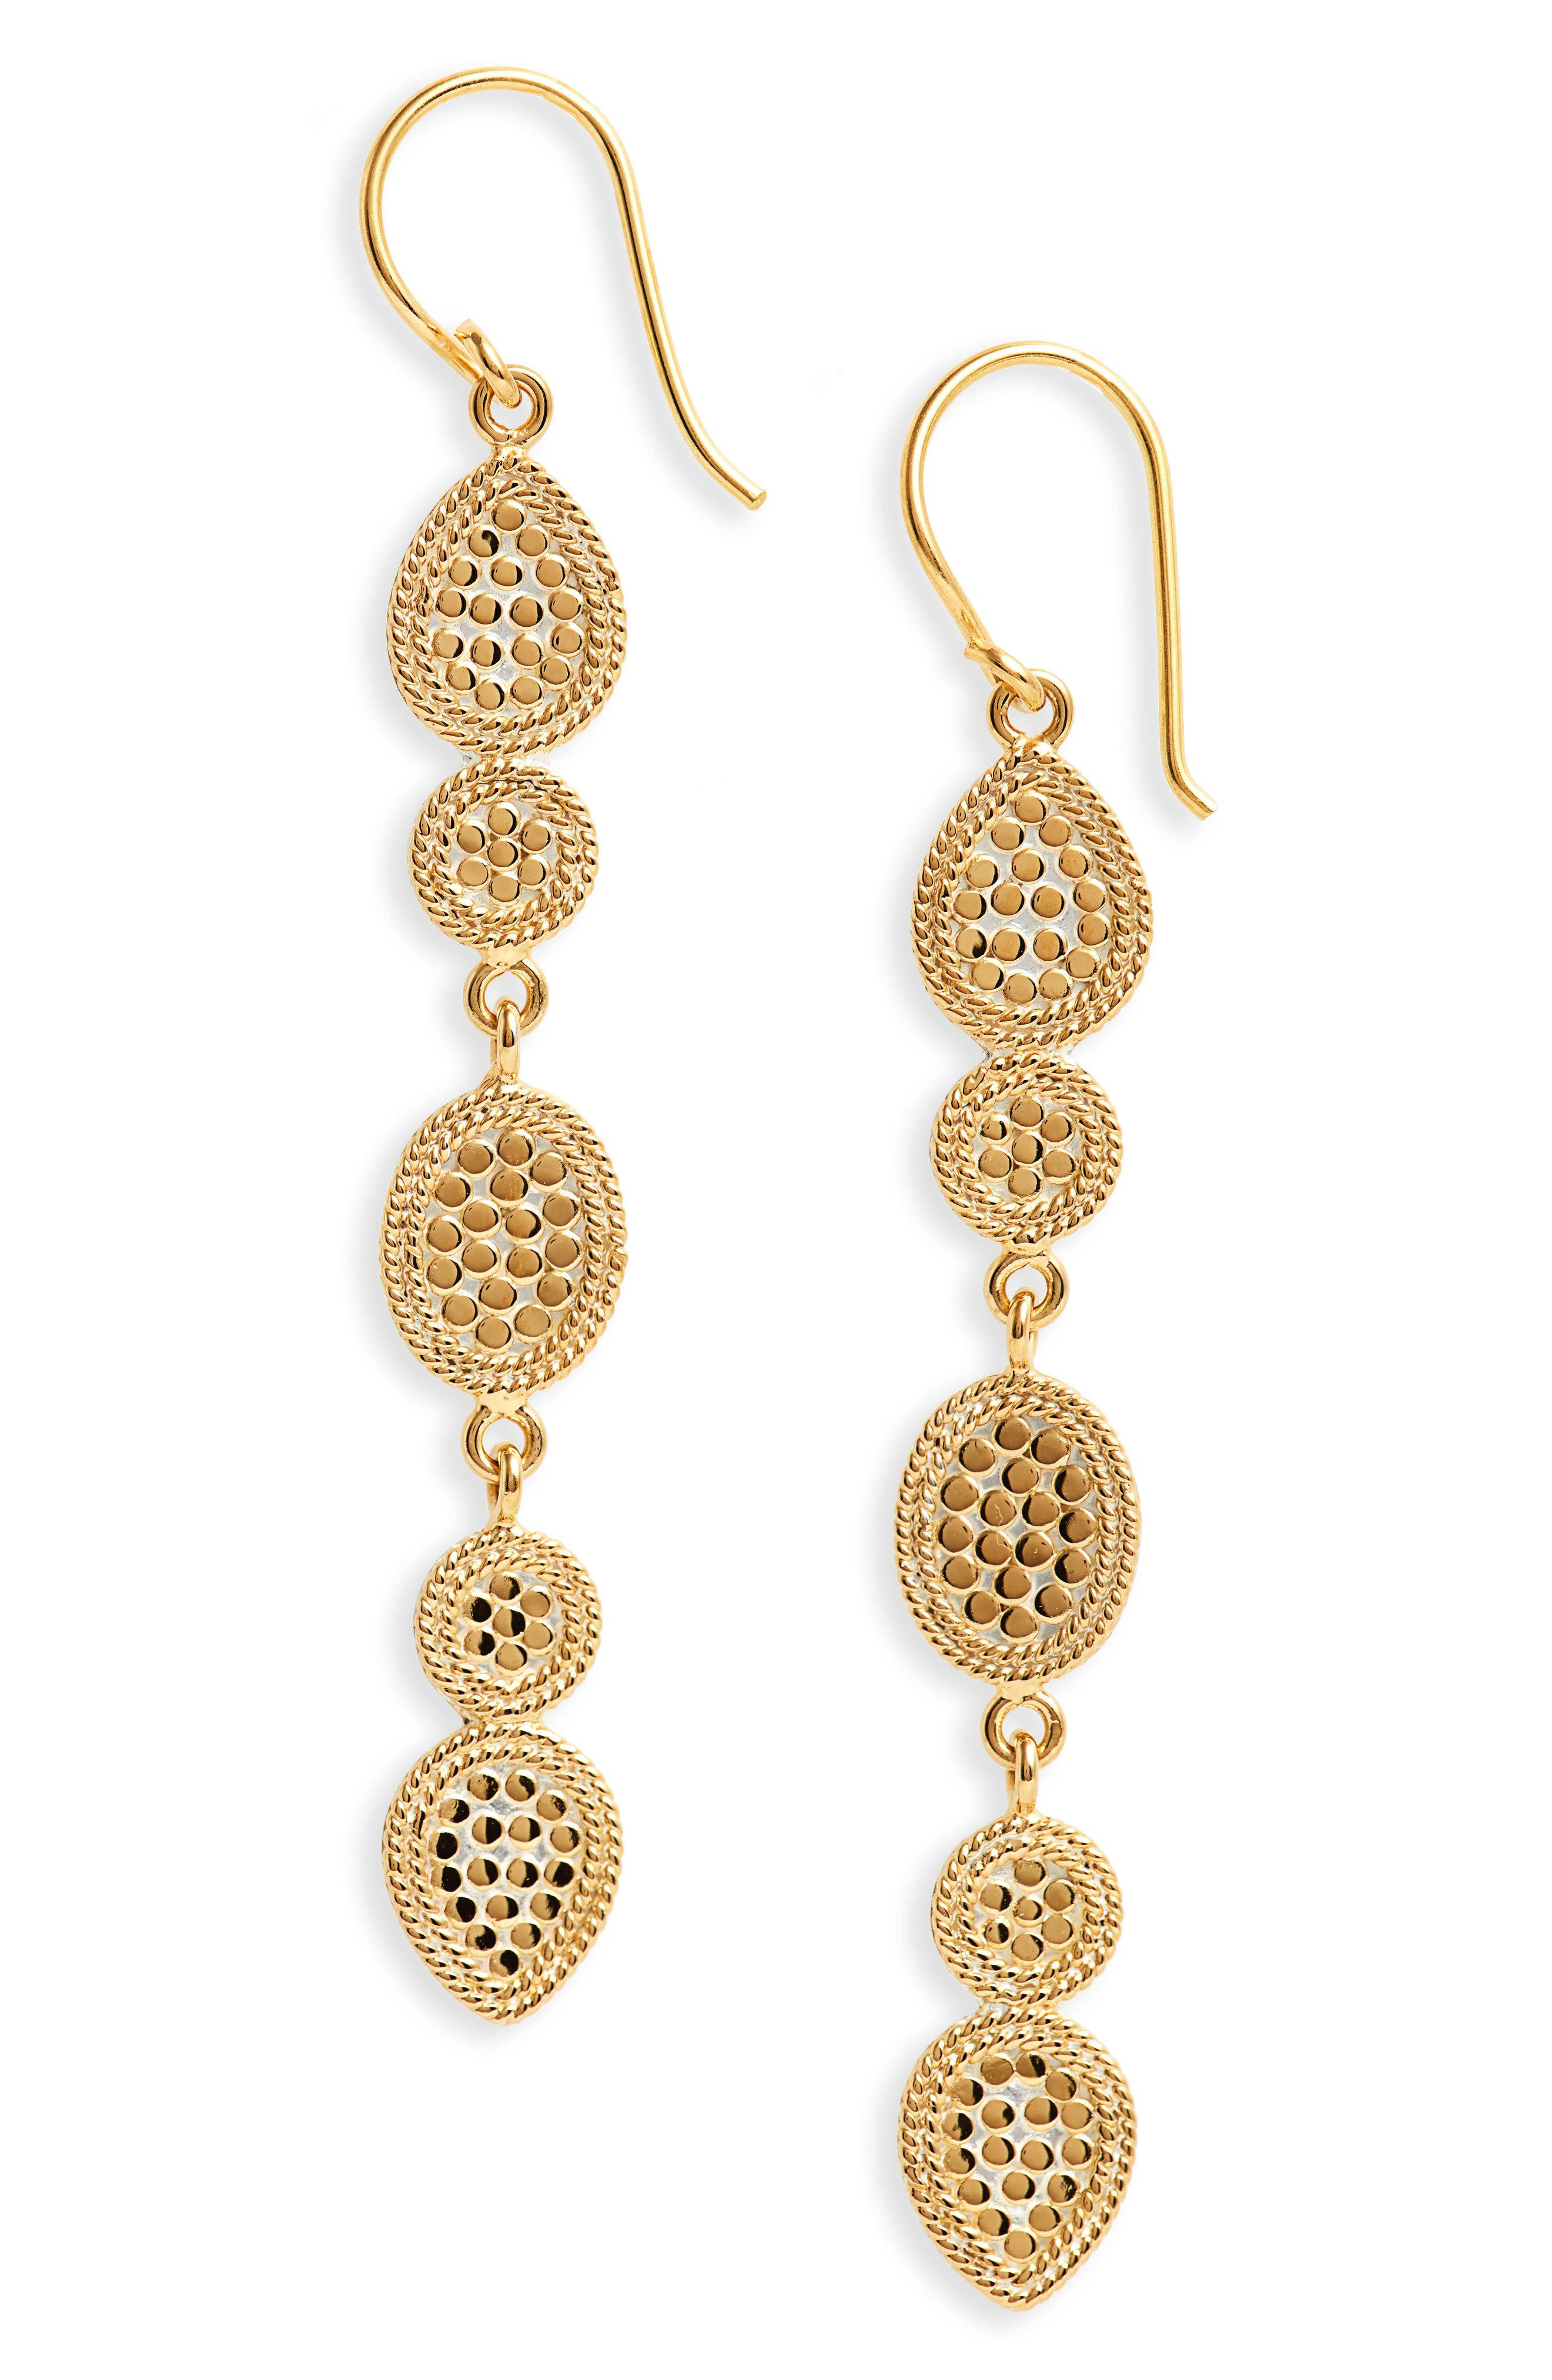 Gold Multidisc Linear Drop Earrings,                         Main,                         color, GOLD